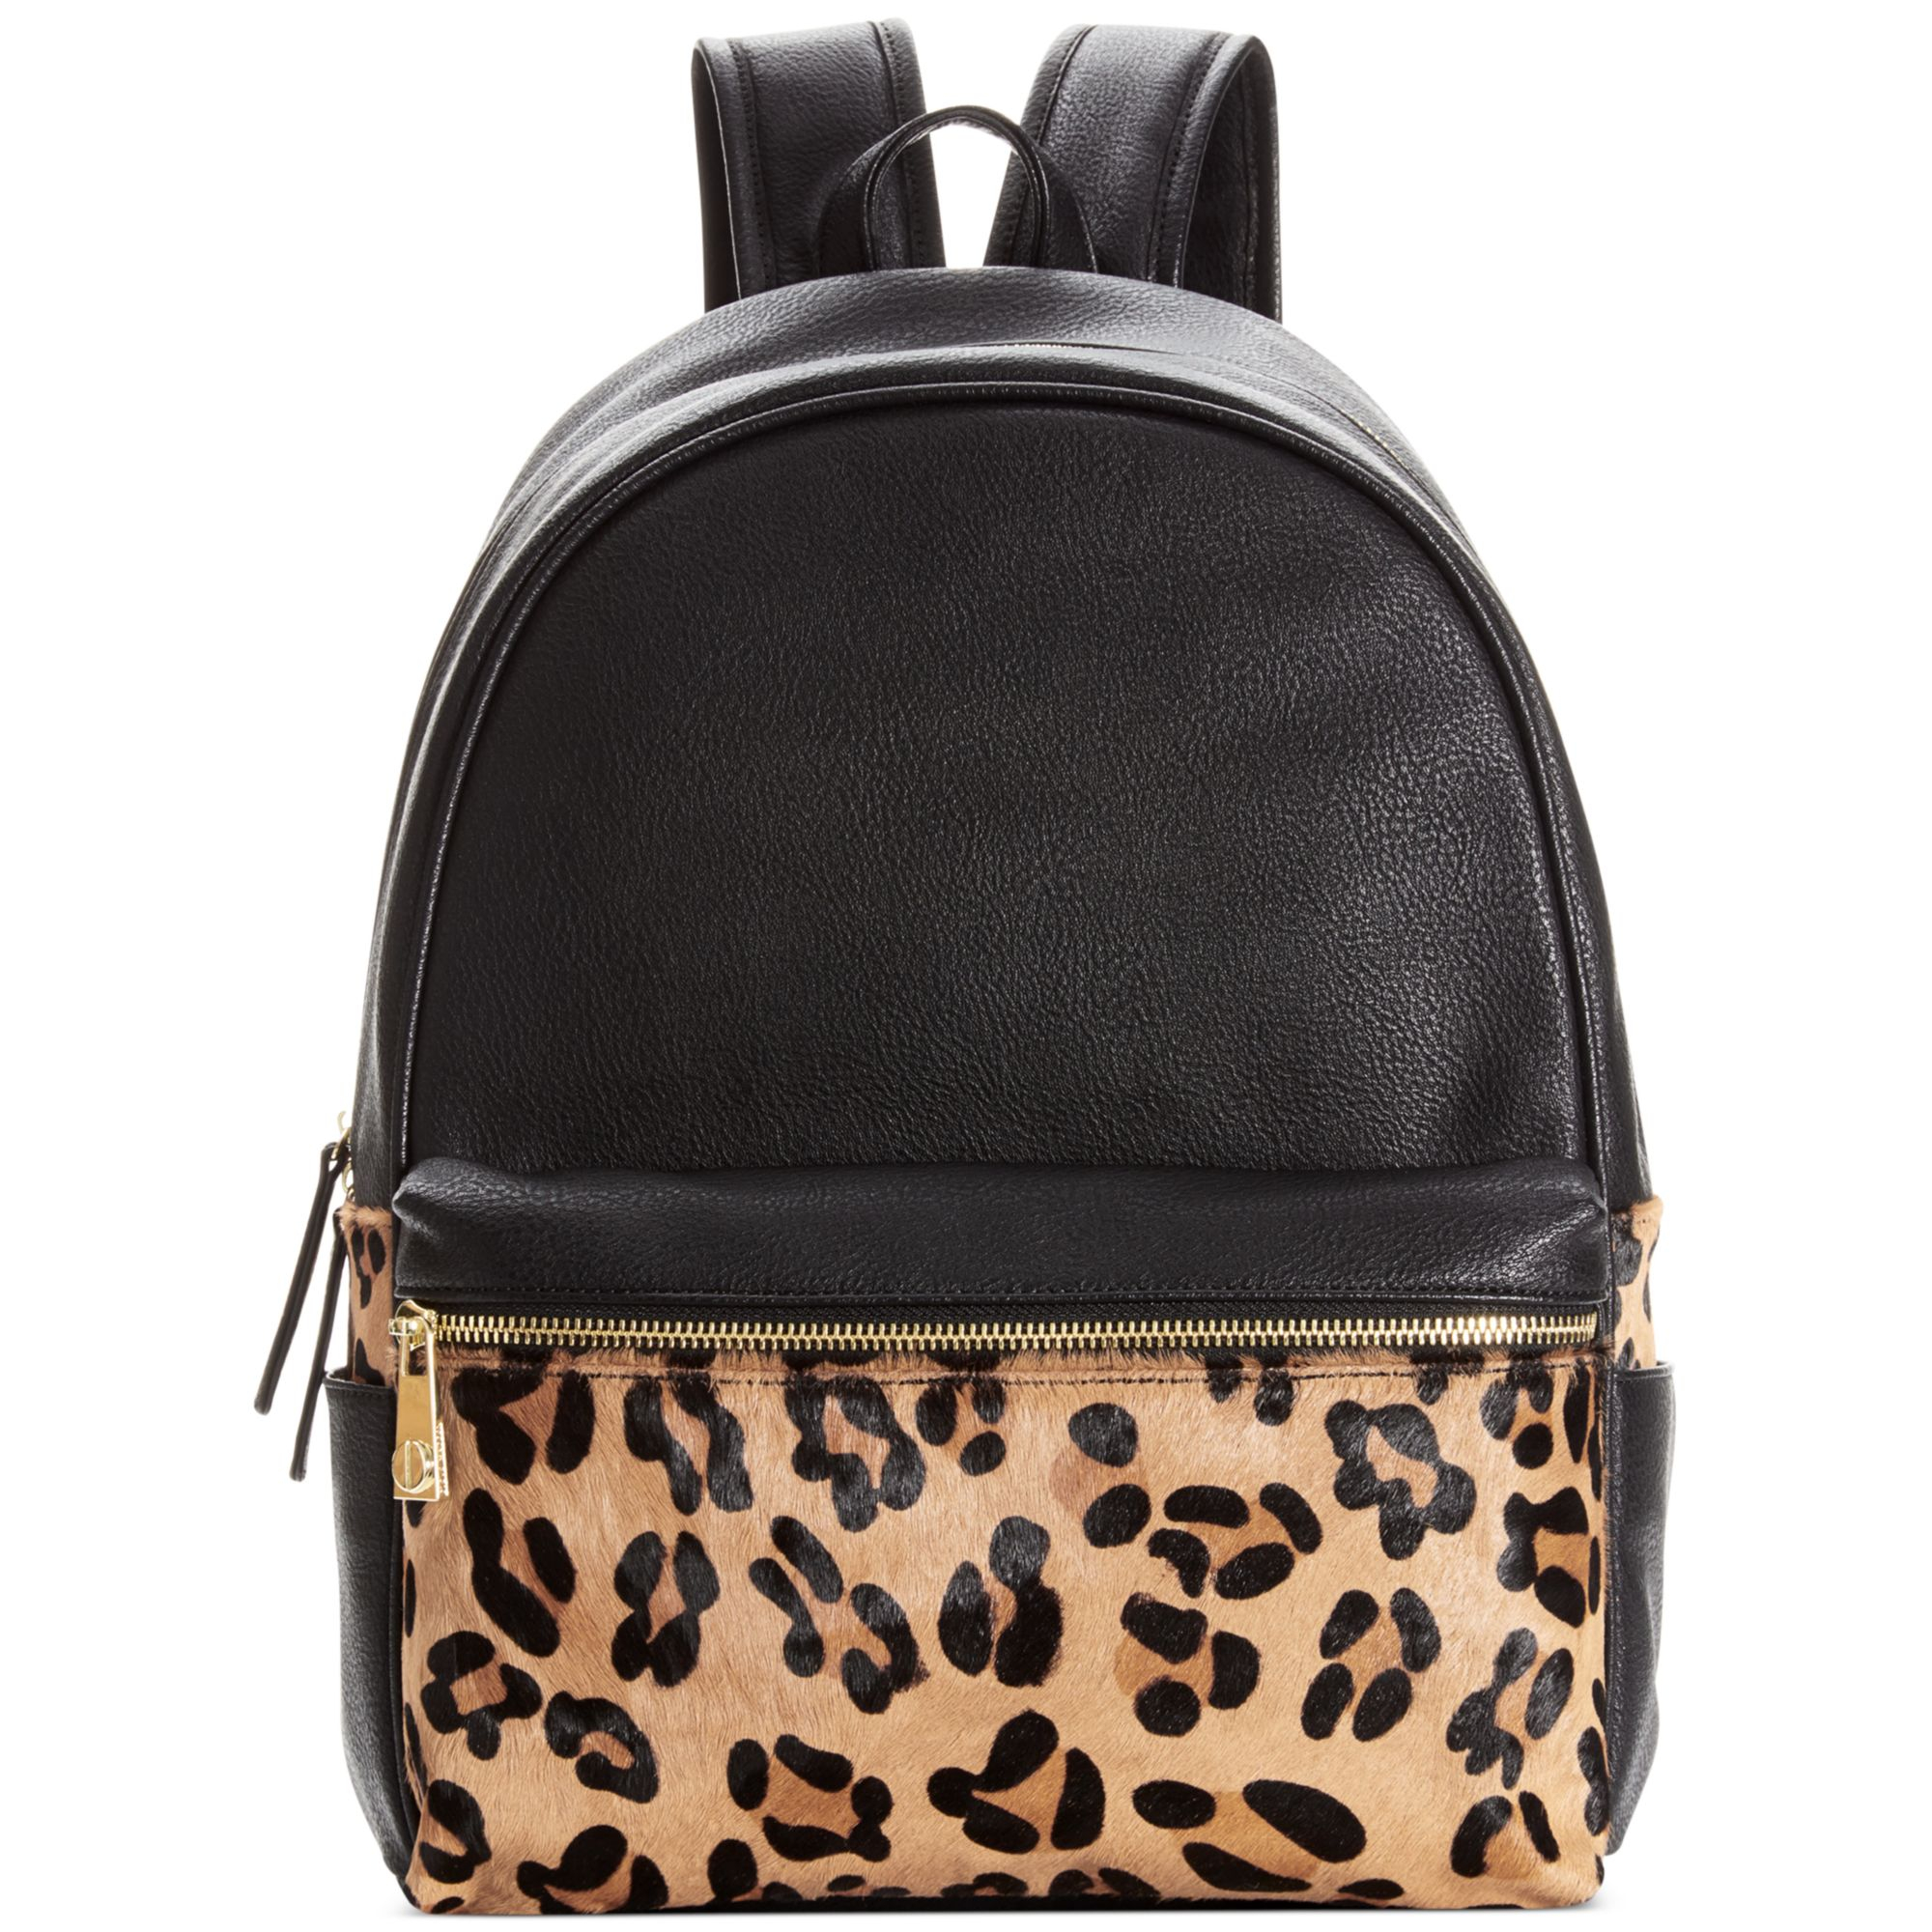 ef091528d1 Steve Madden Bmonako Backpack in Black (Leopard)   Lyst